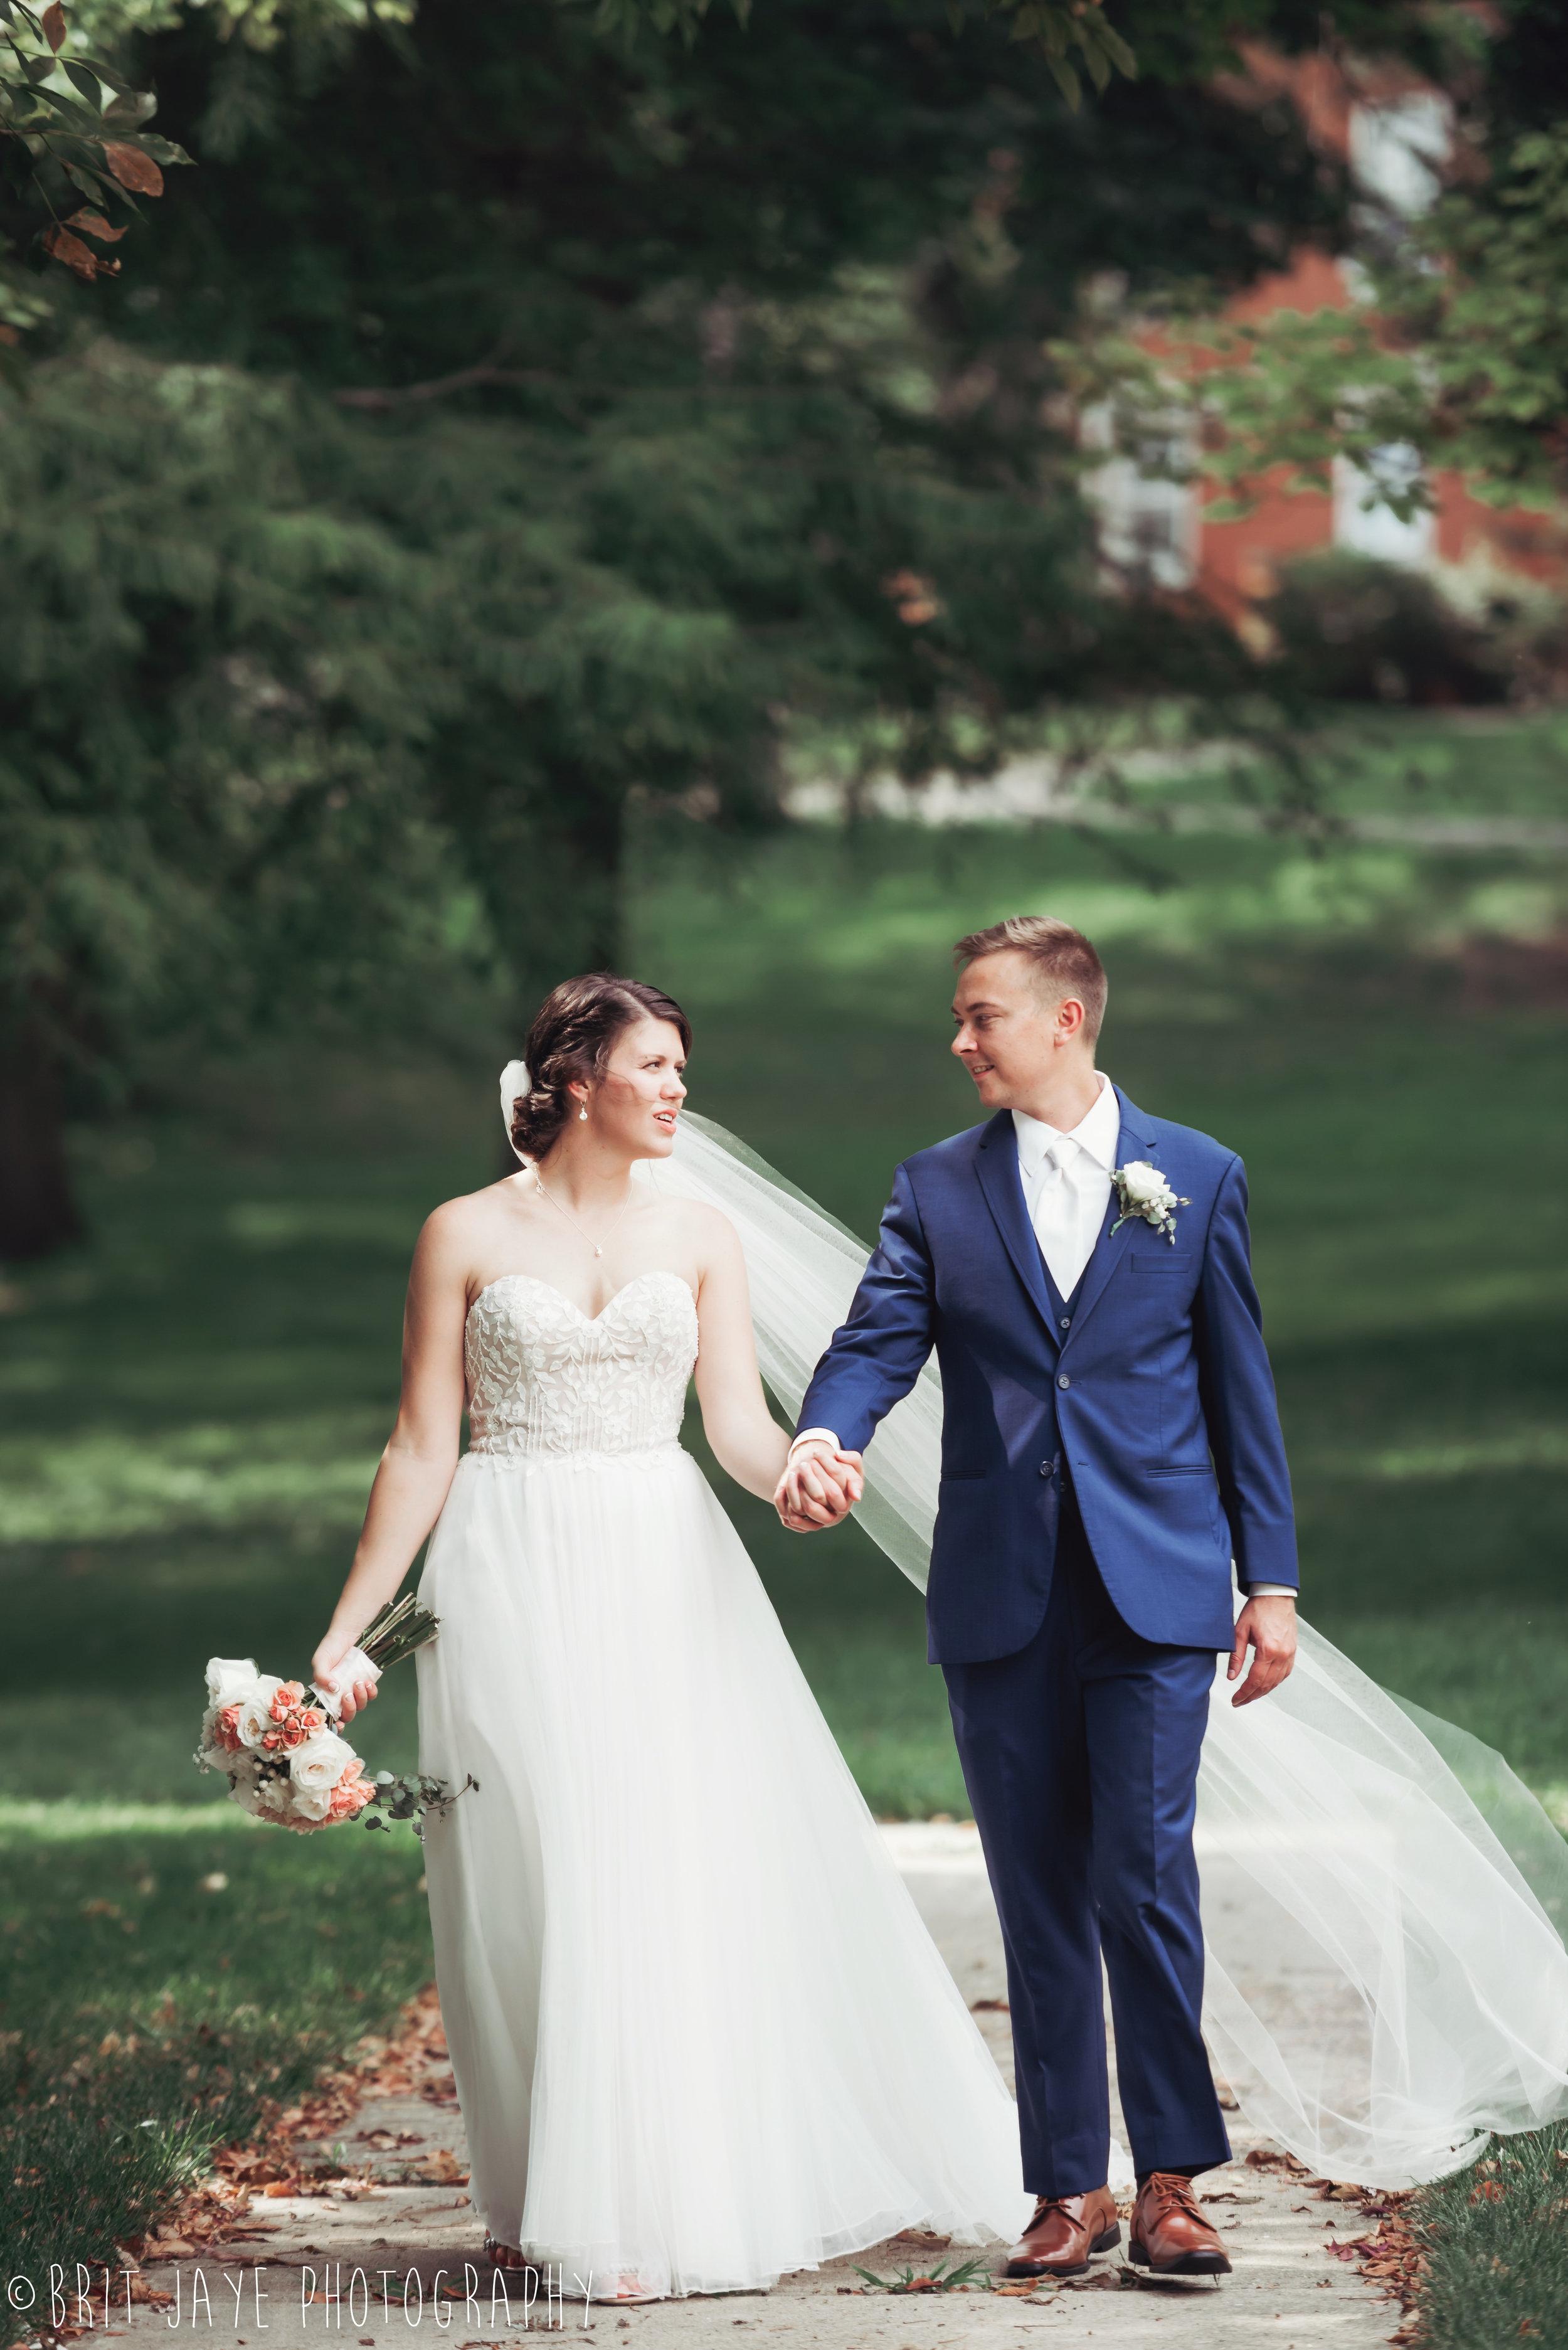 Champaign_aviation_museum_travel_inspired_wedding-1-2.jpg